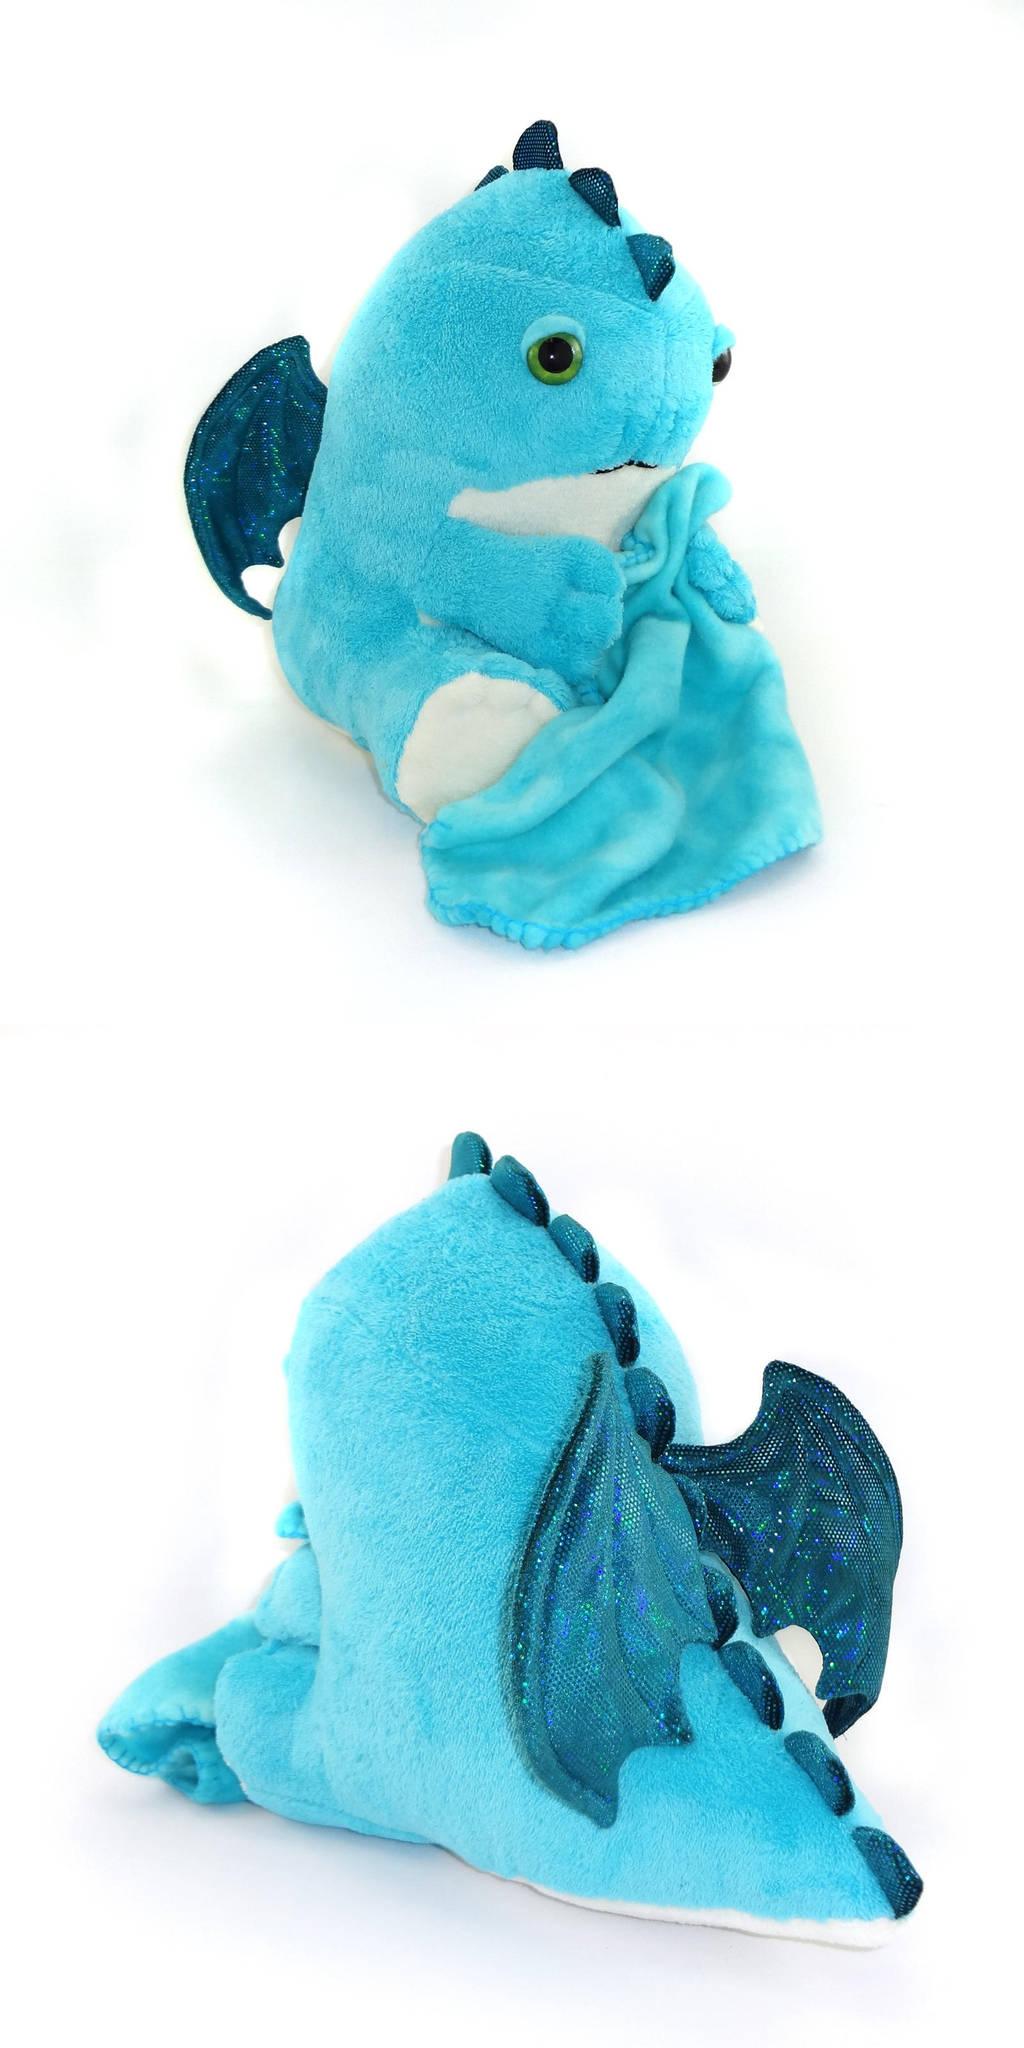 Blue sleepy dragon by Koreena